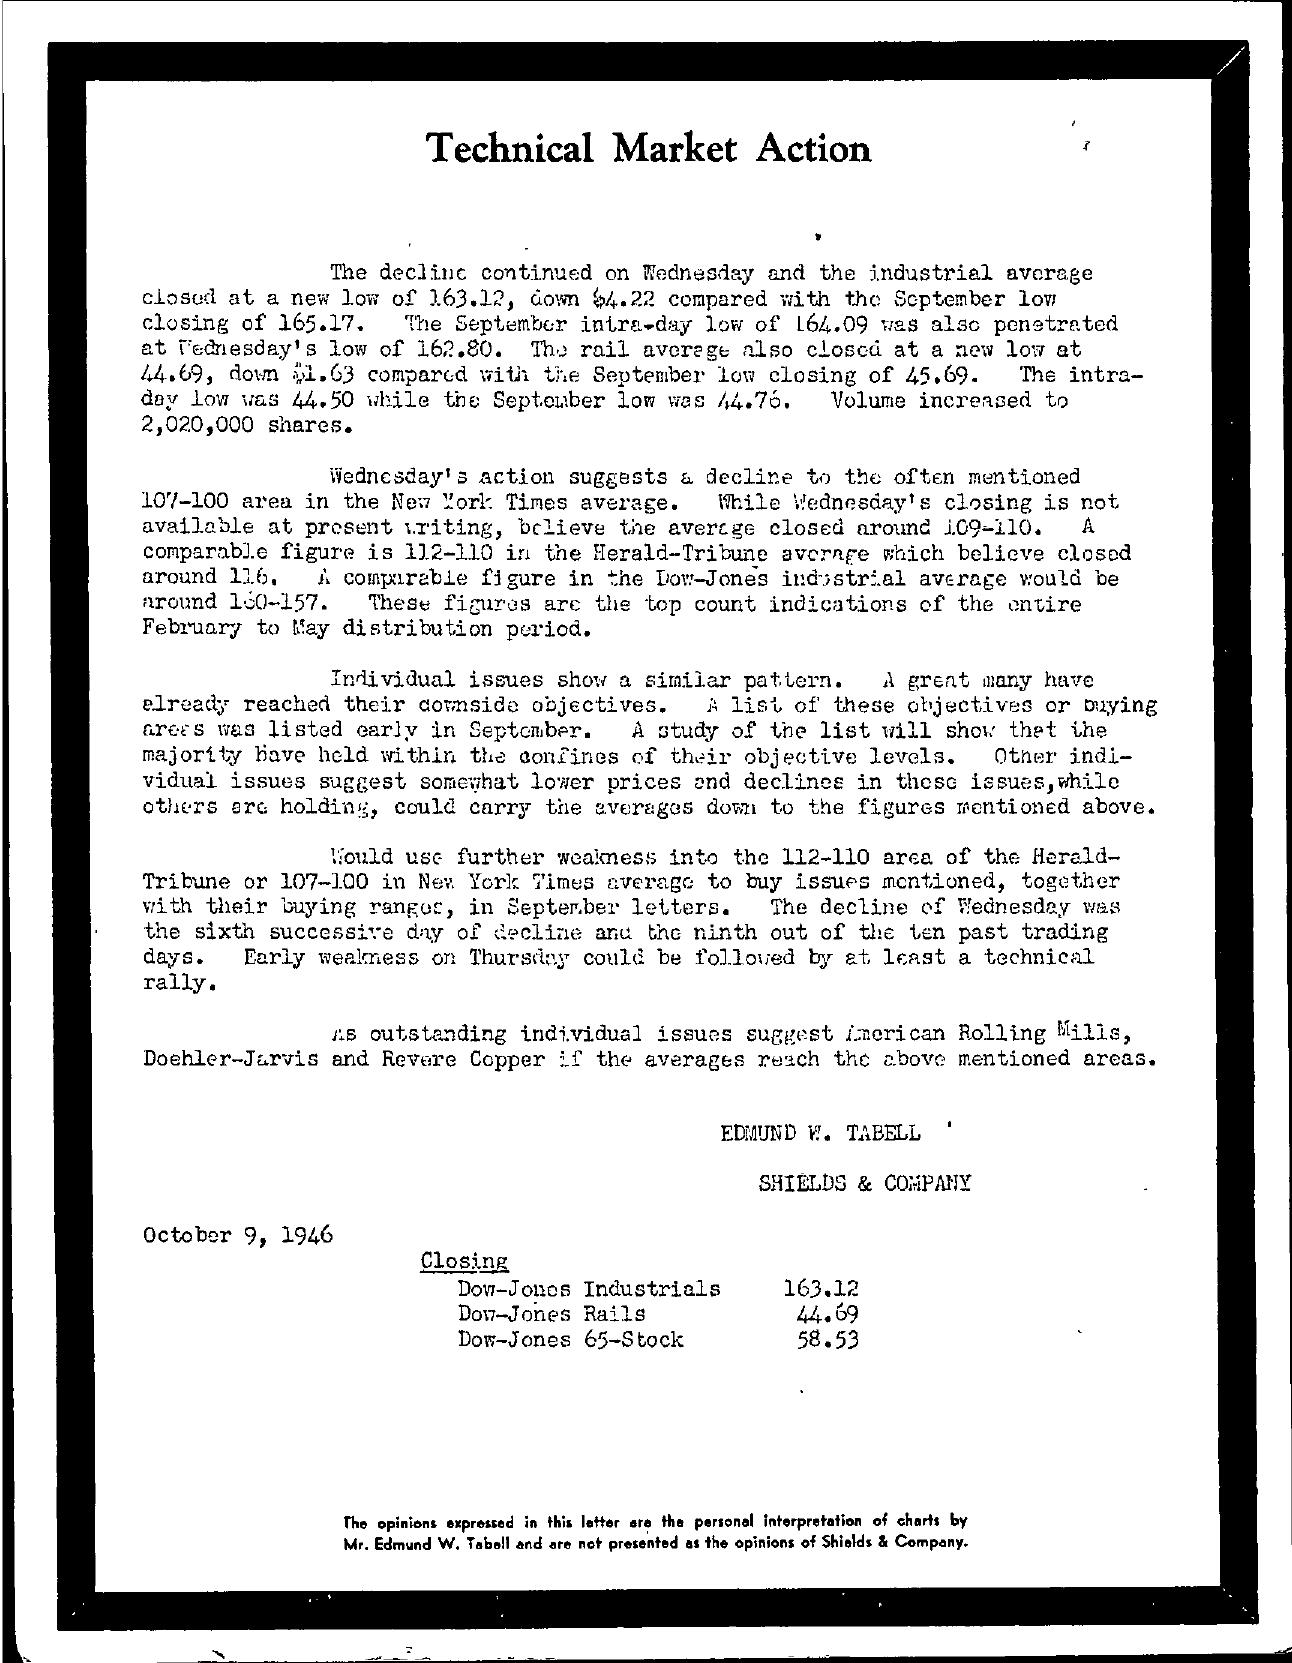 Tabell's Market Letter - October 09, 1946